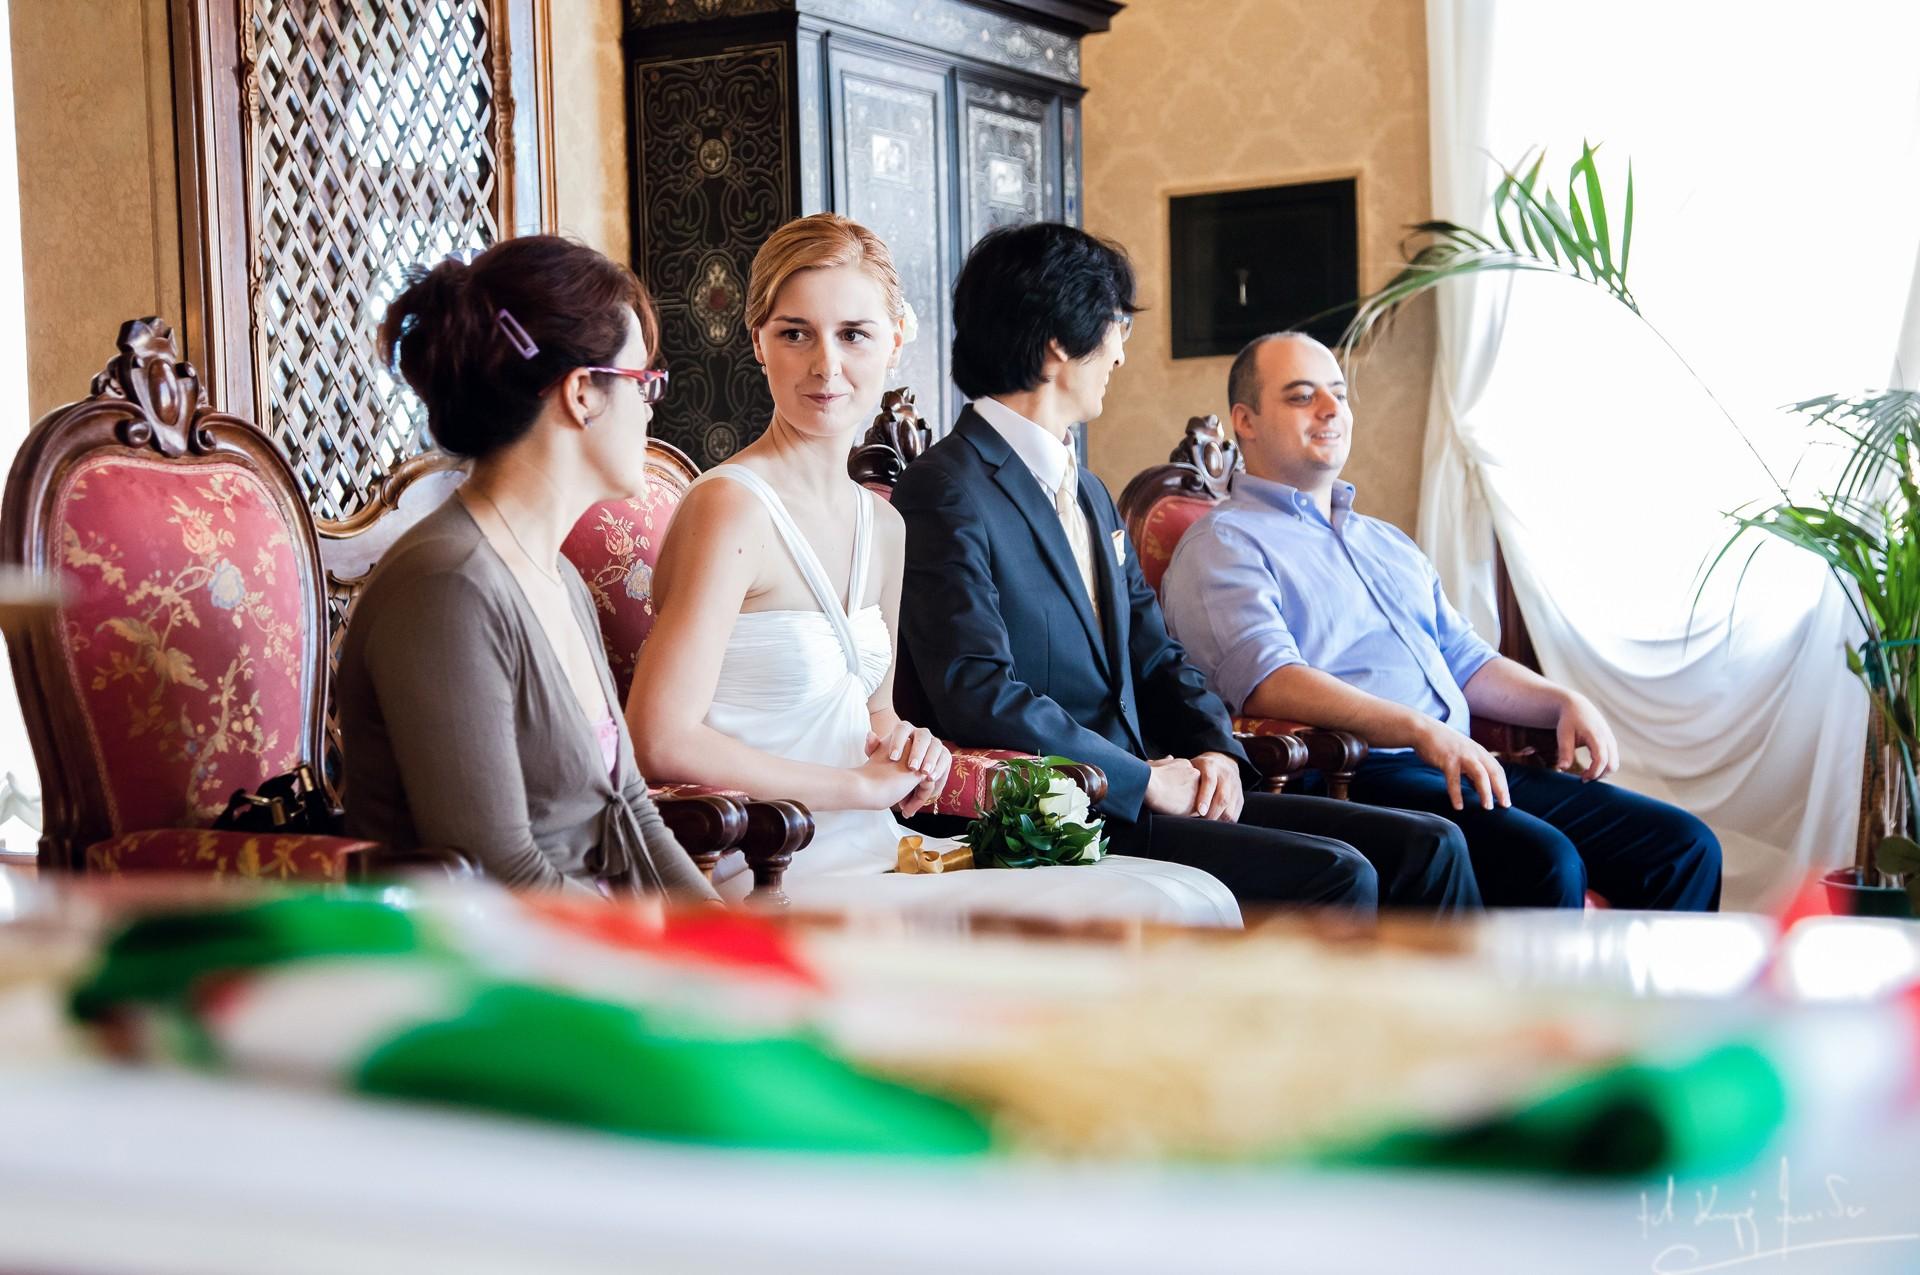 Ślub w wenecji 24 Manuela Luiza & Young Seon Song